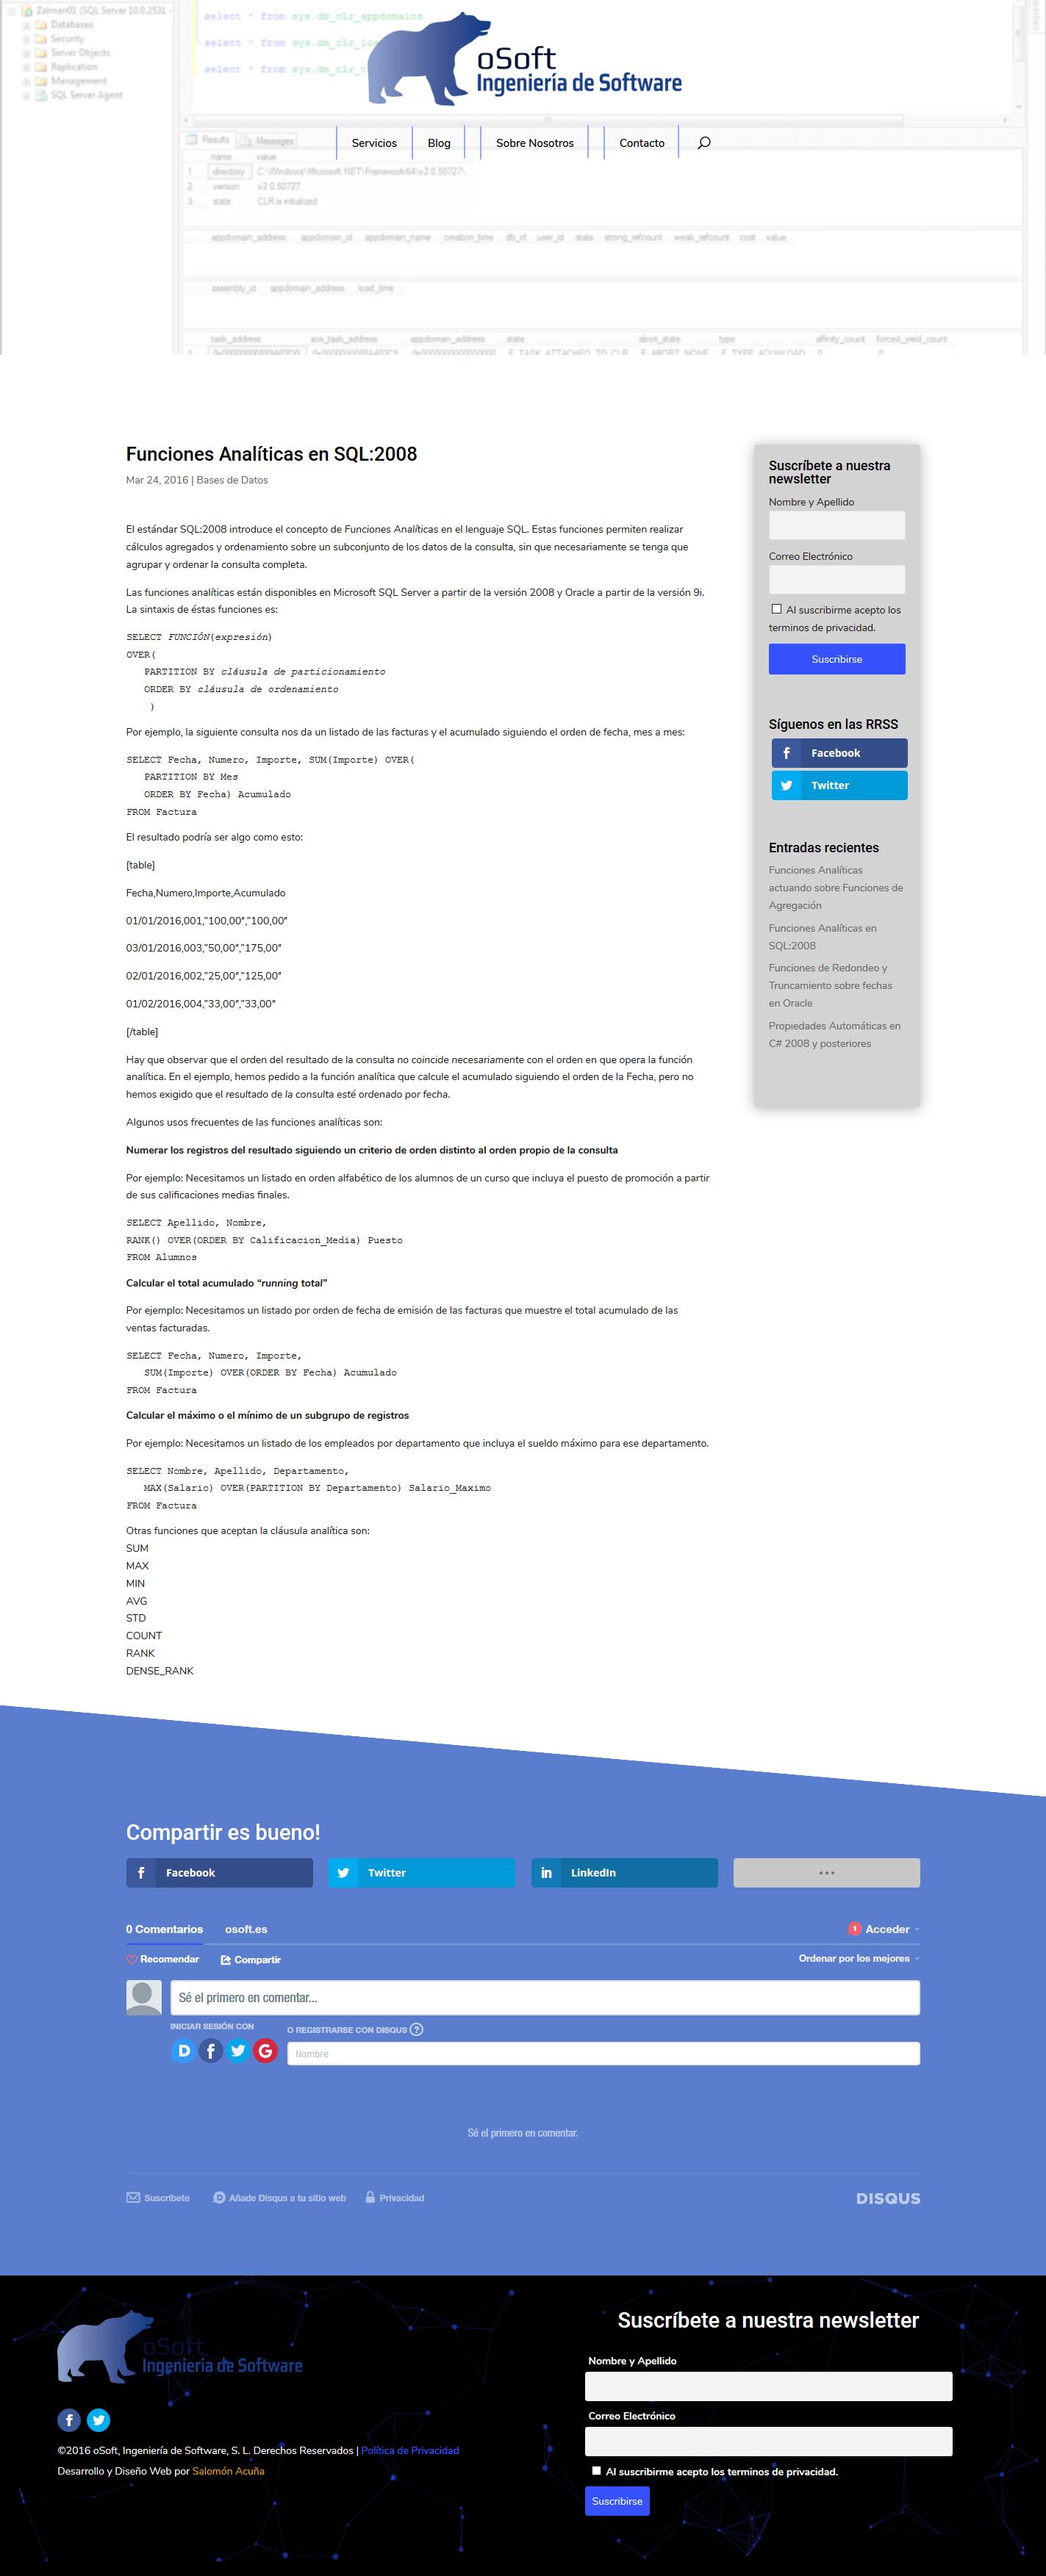 oSoft - Ingenierías de Software 4